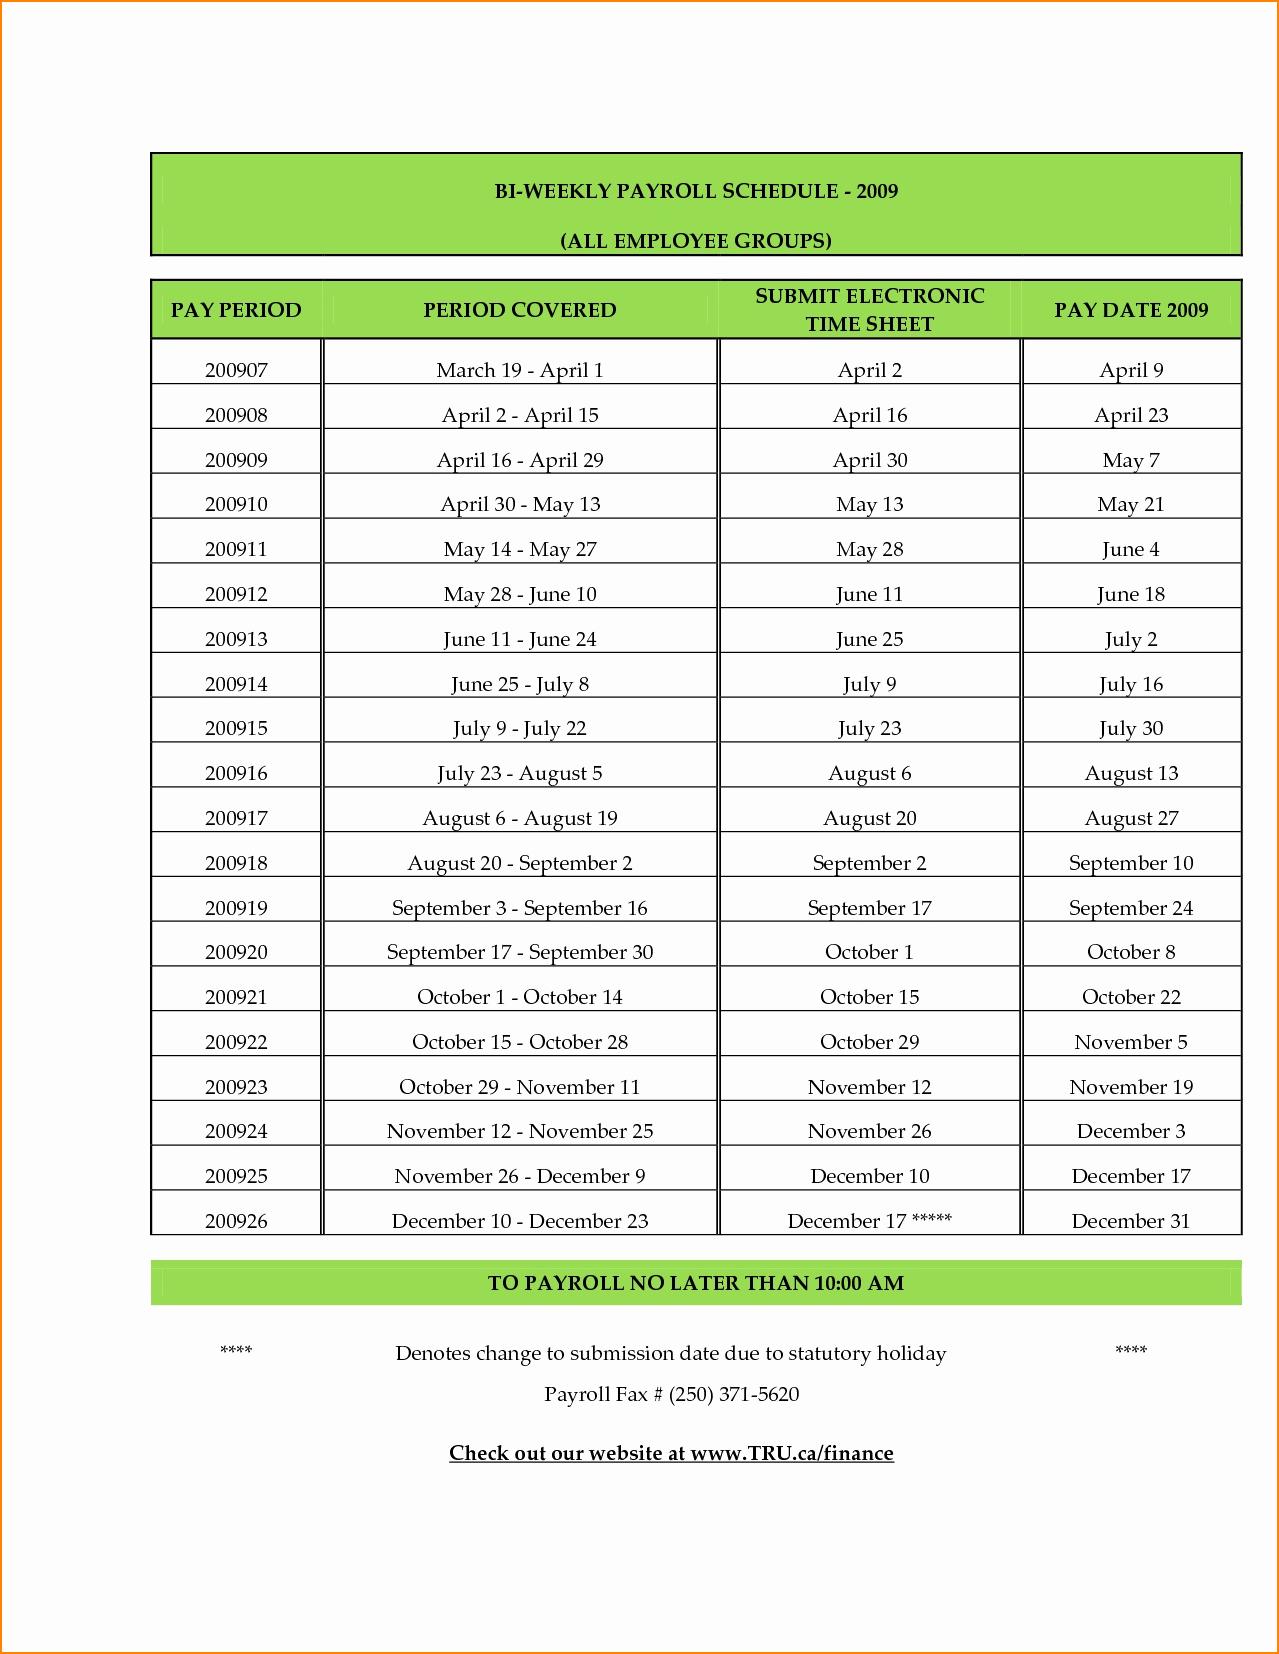 Payroll Calendar Template Unique 5 Biweekly Payroll Calendar Template